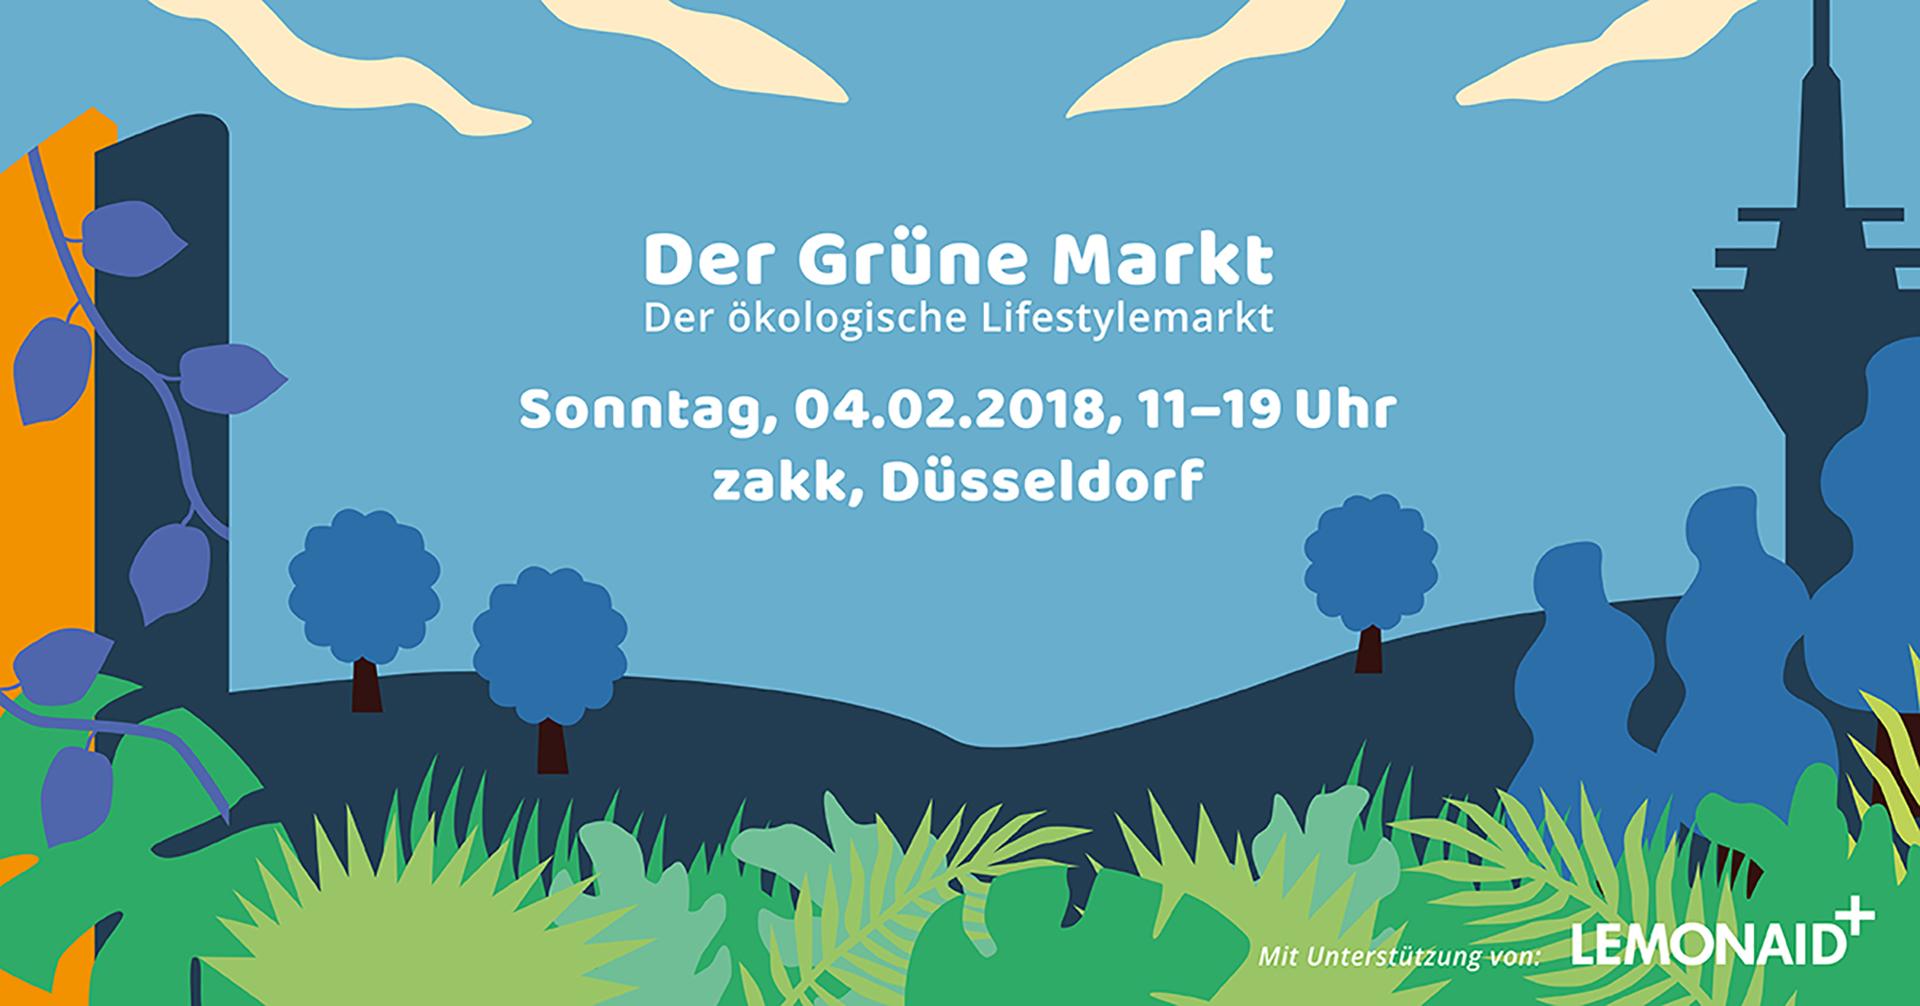 GrünerMarkt Ddorf FB EventCover v2